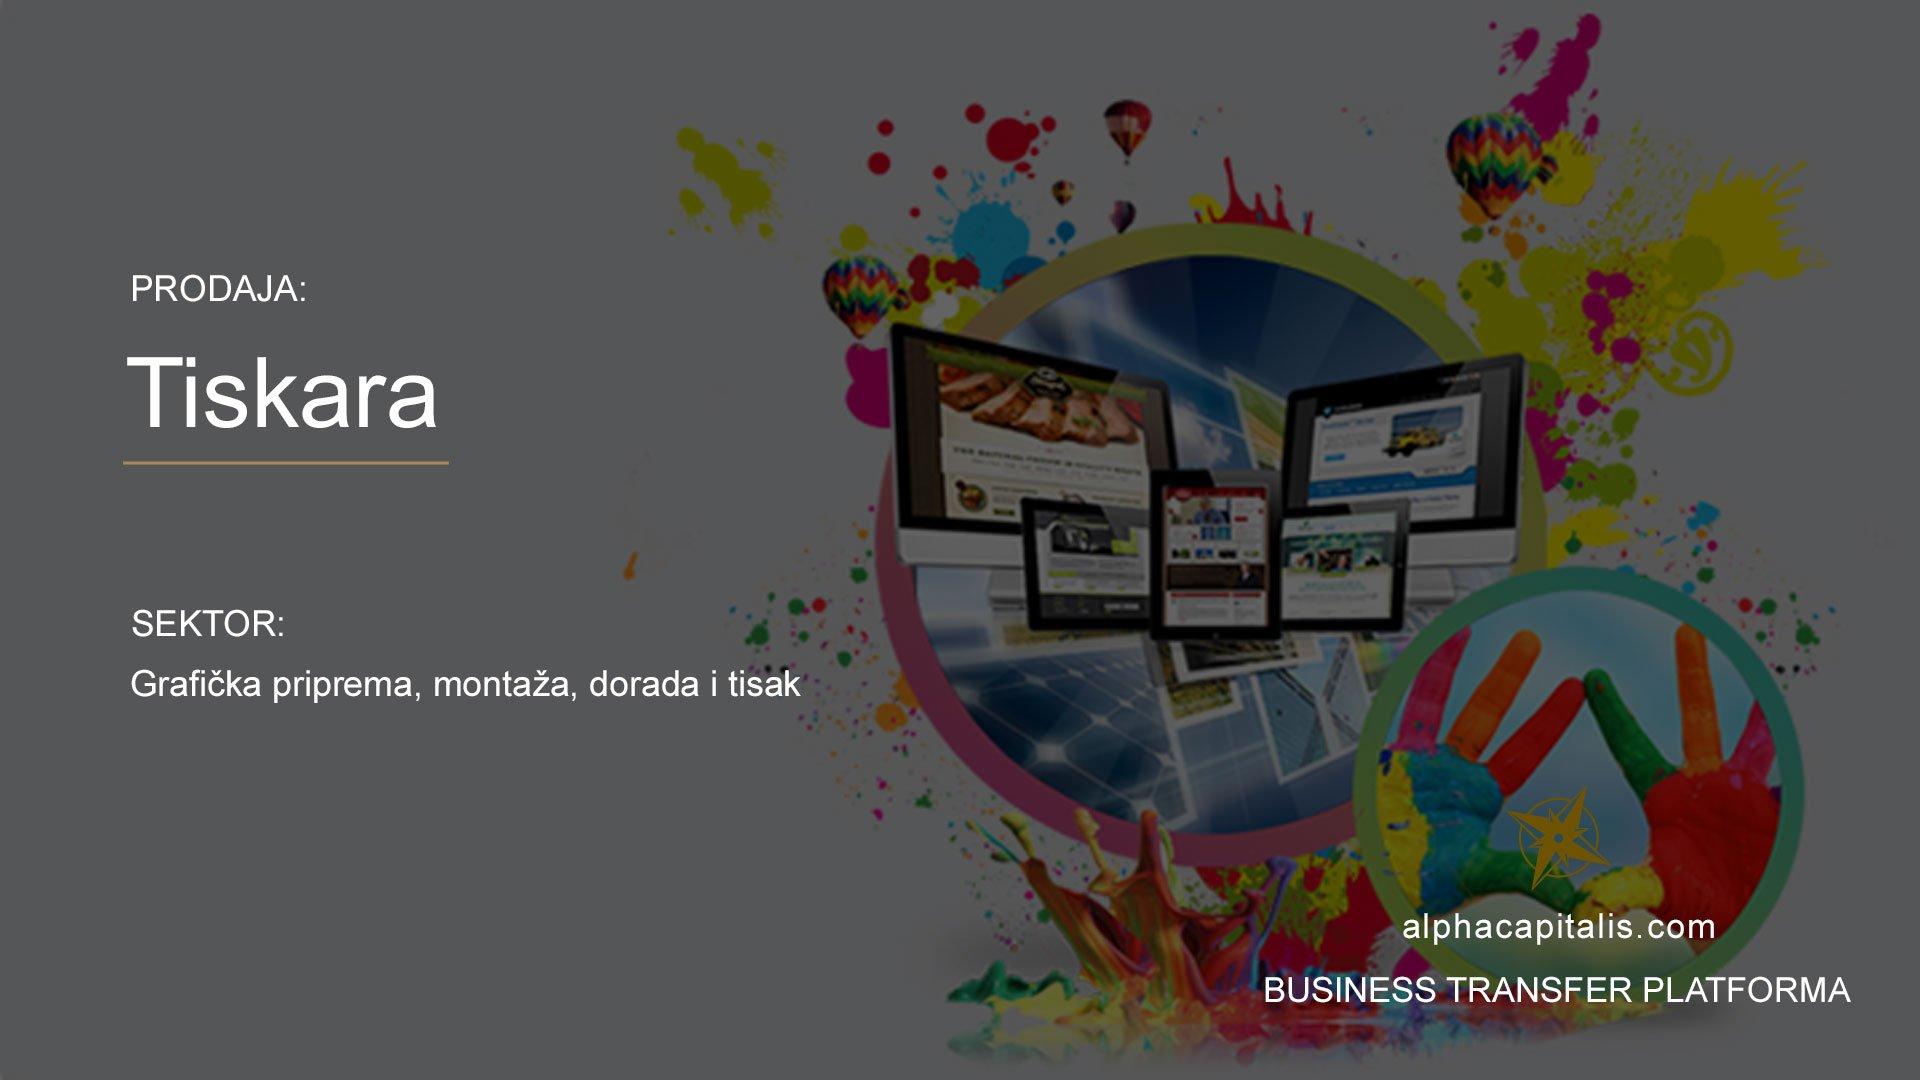 Alpha-Capitalis--Business-Transfer-Platforma_Tiskara